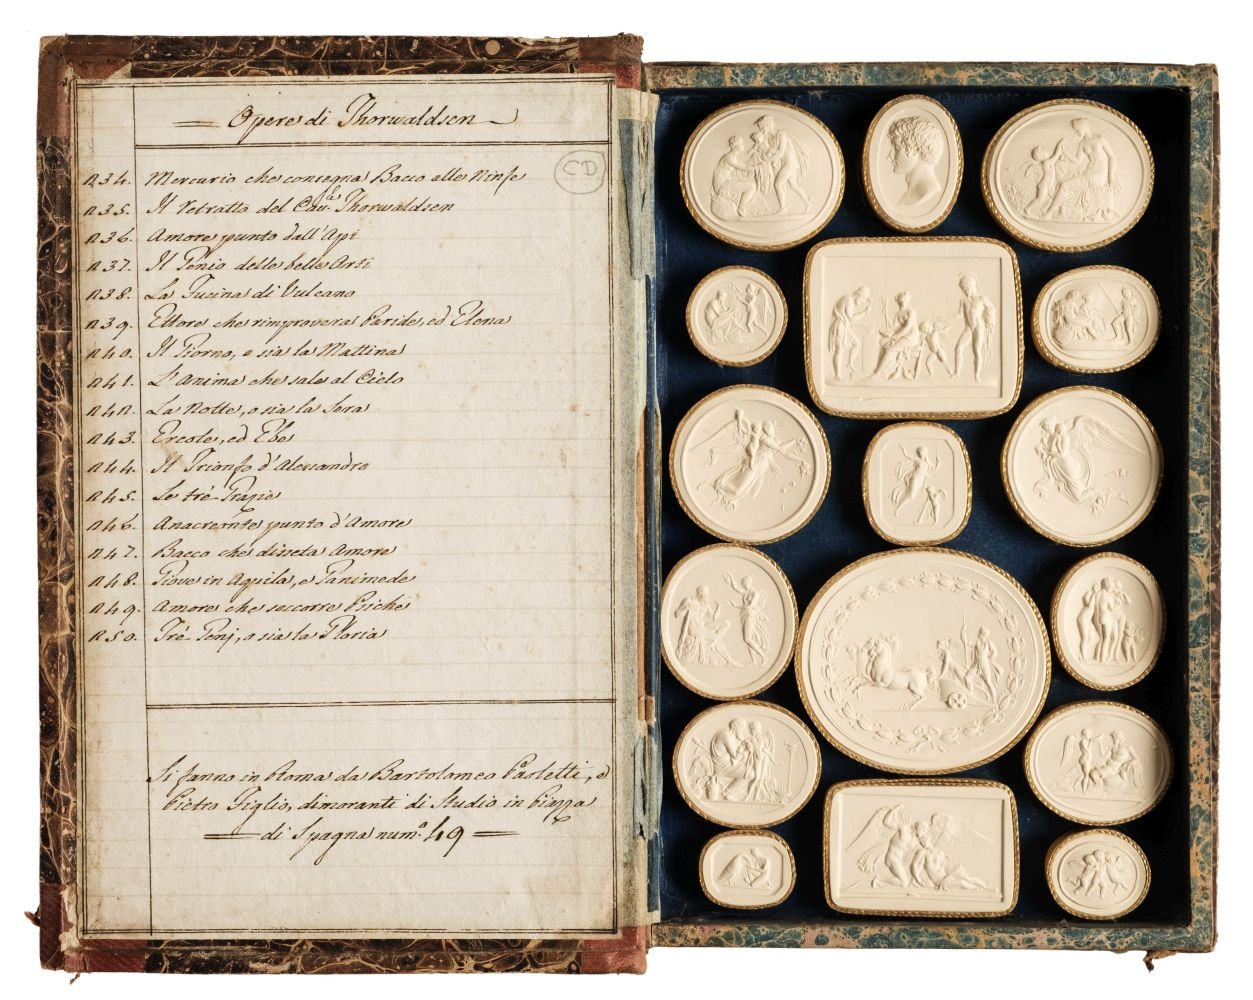 Paoletti (Bartolomeo and Pietro). A collection of 300 plaster cameos, 1820